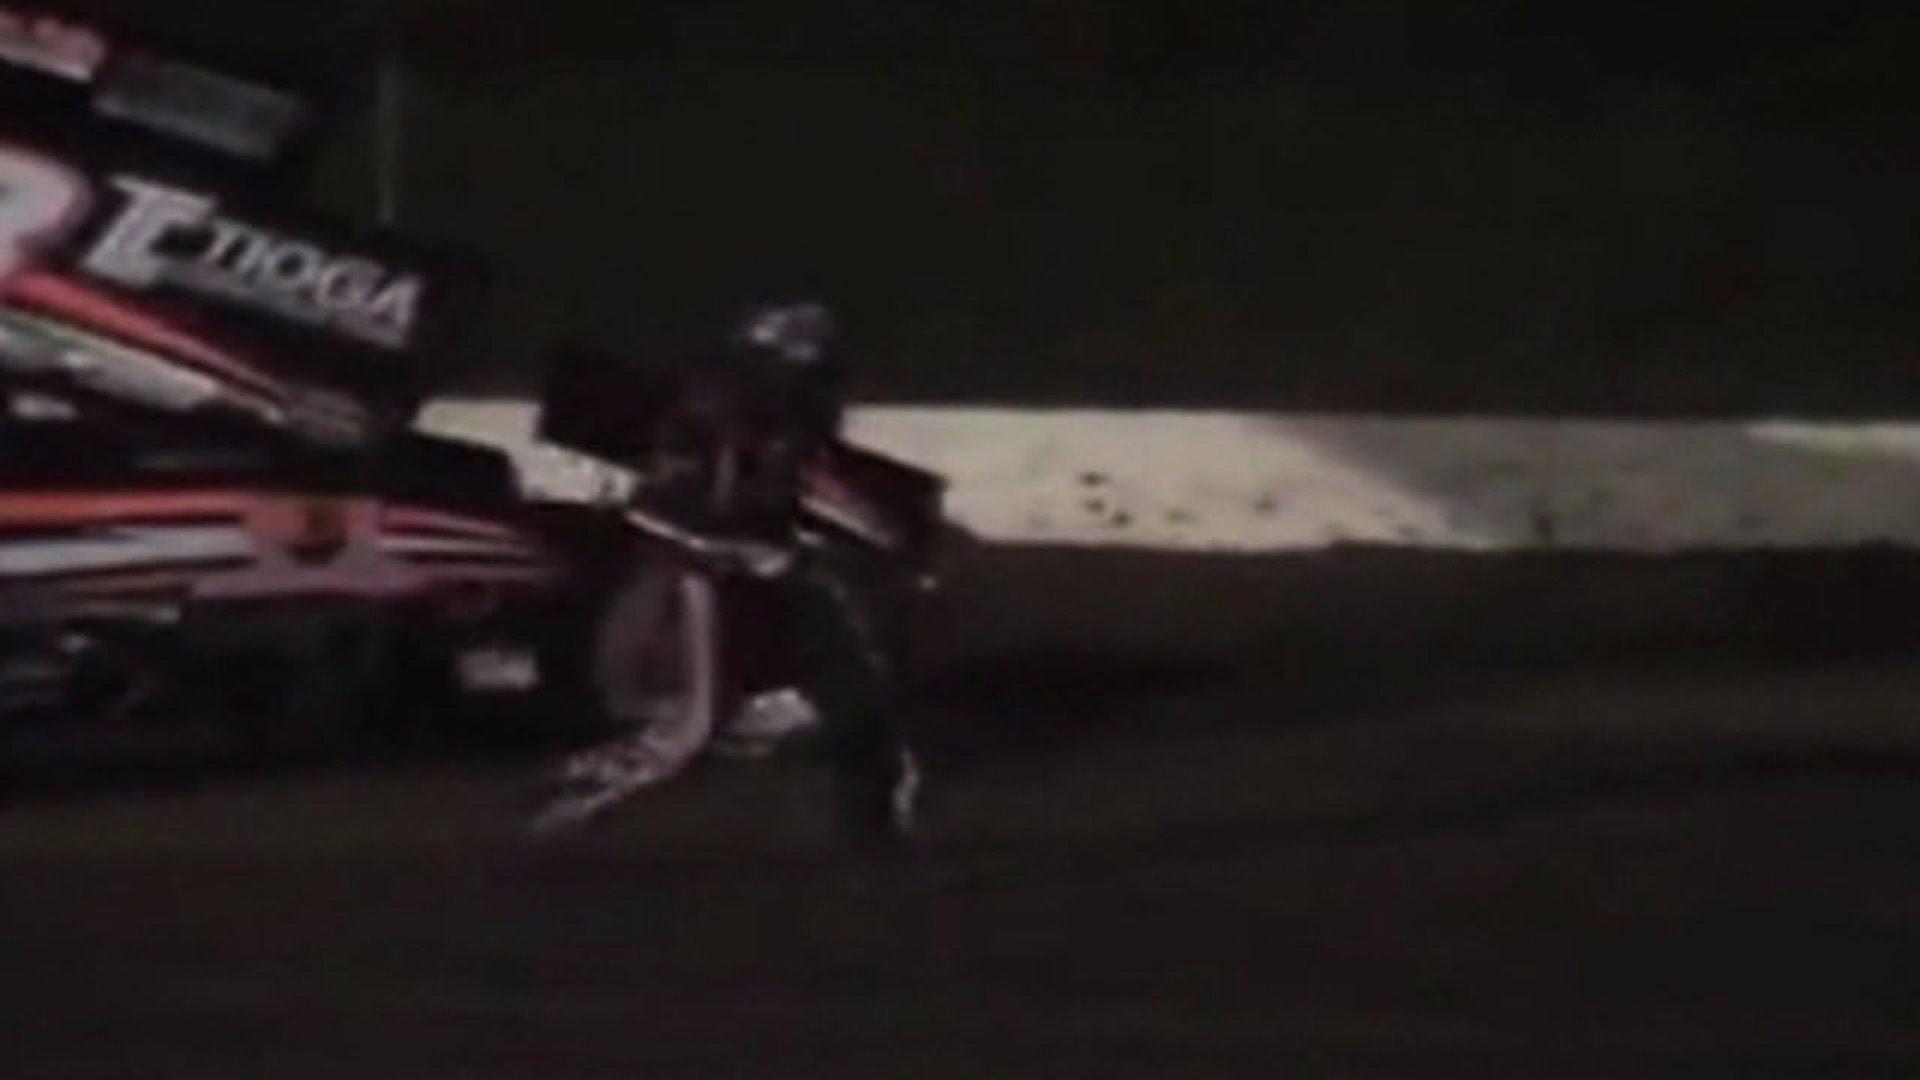 Tony Ward Jr. was hit and killed by NASCAR Tony Stewart during Sprint Car race